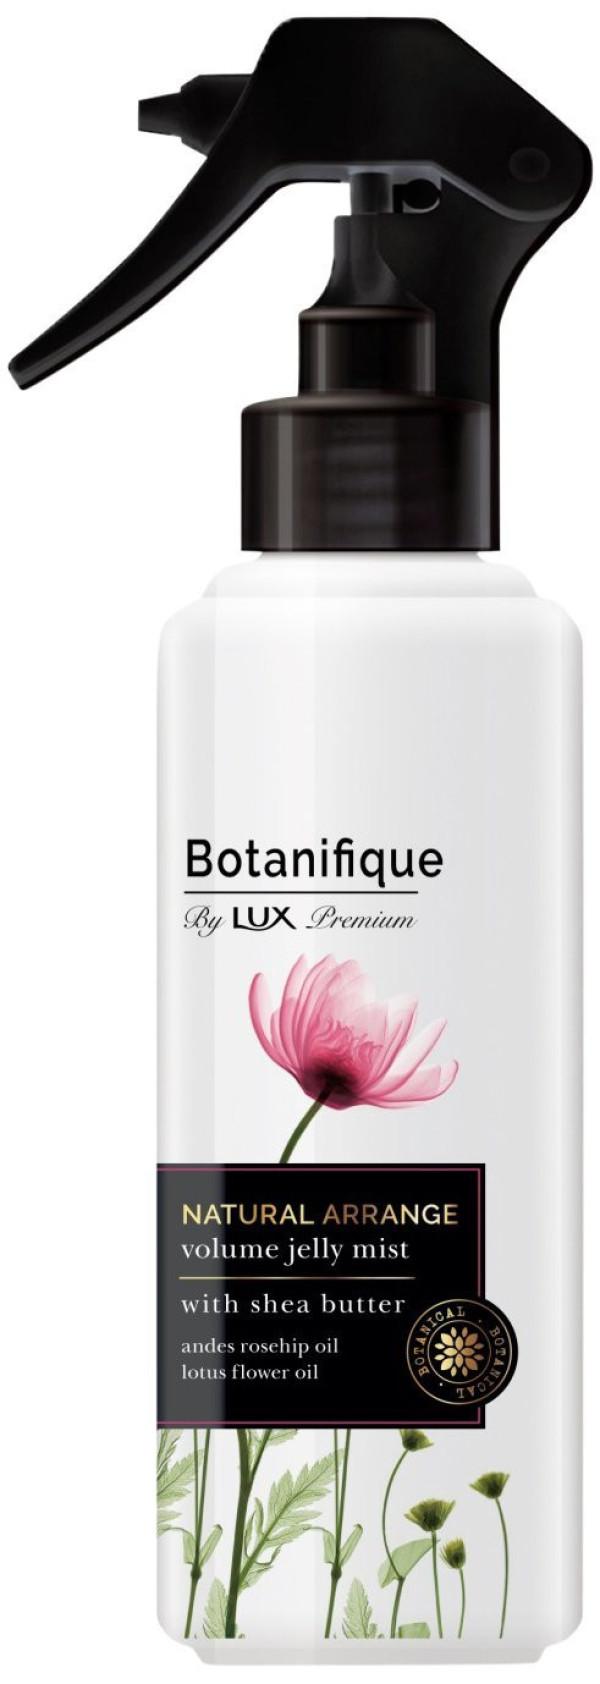 Мист для объема волос Botanifique by LUX Volume Jelly Mist